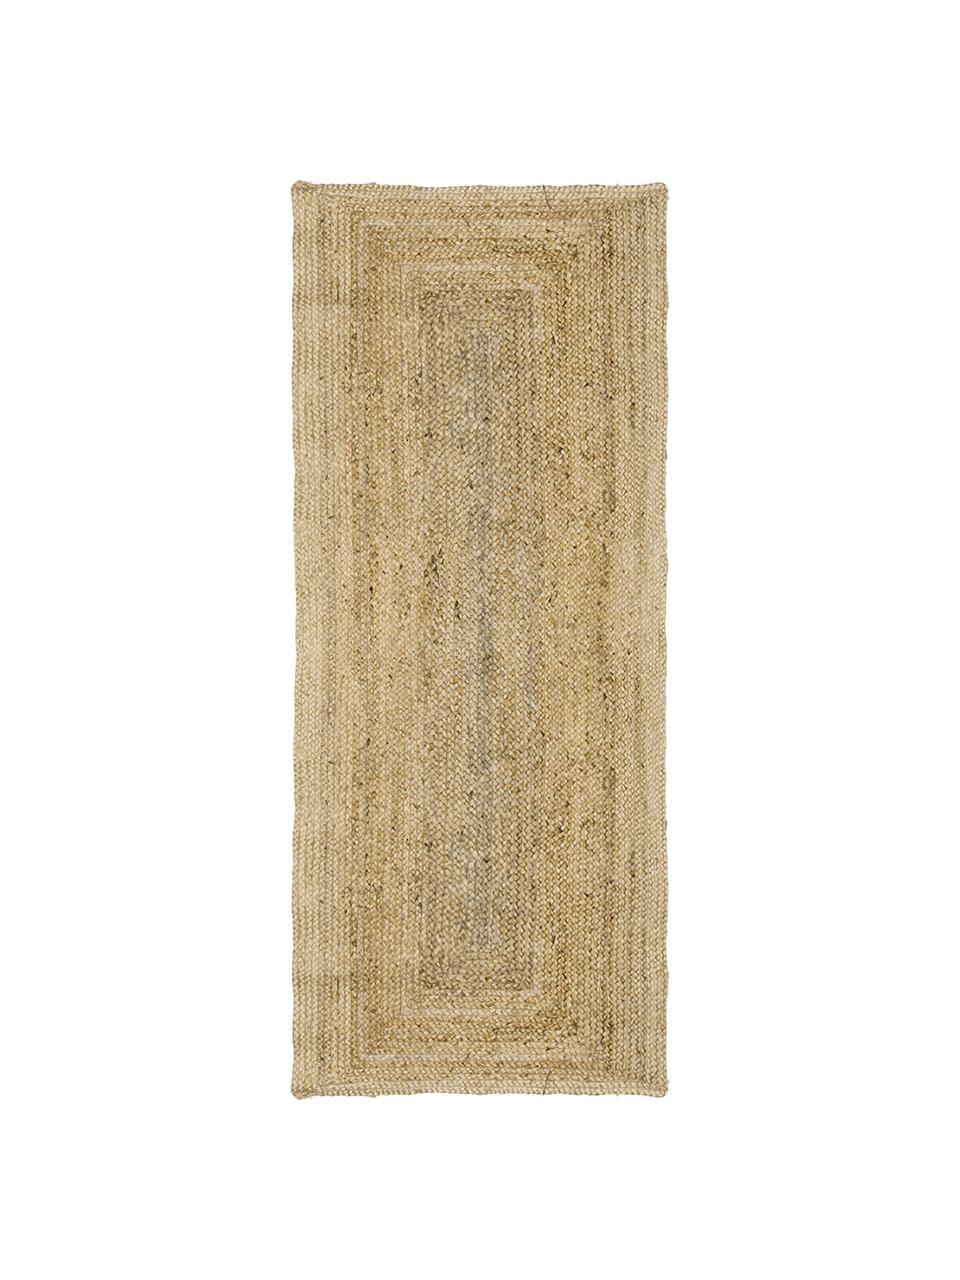 Handgefertigter Jute-Läufer Sharmila, 100% Jute, Beige, 80 x 250 cm